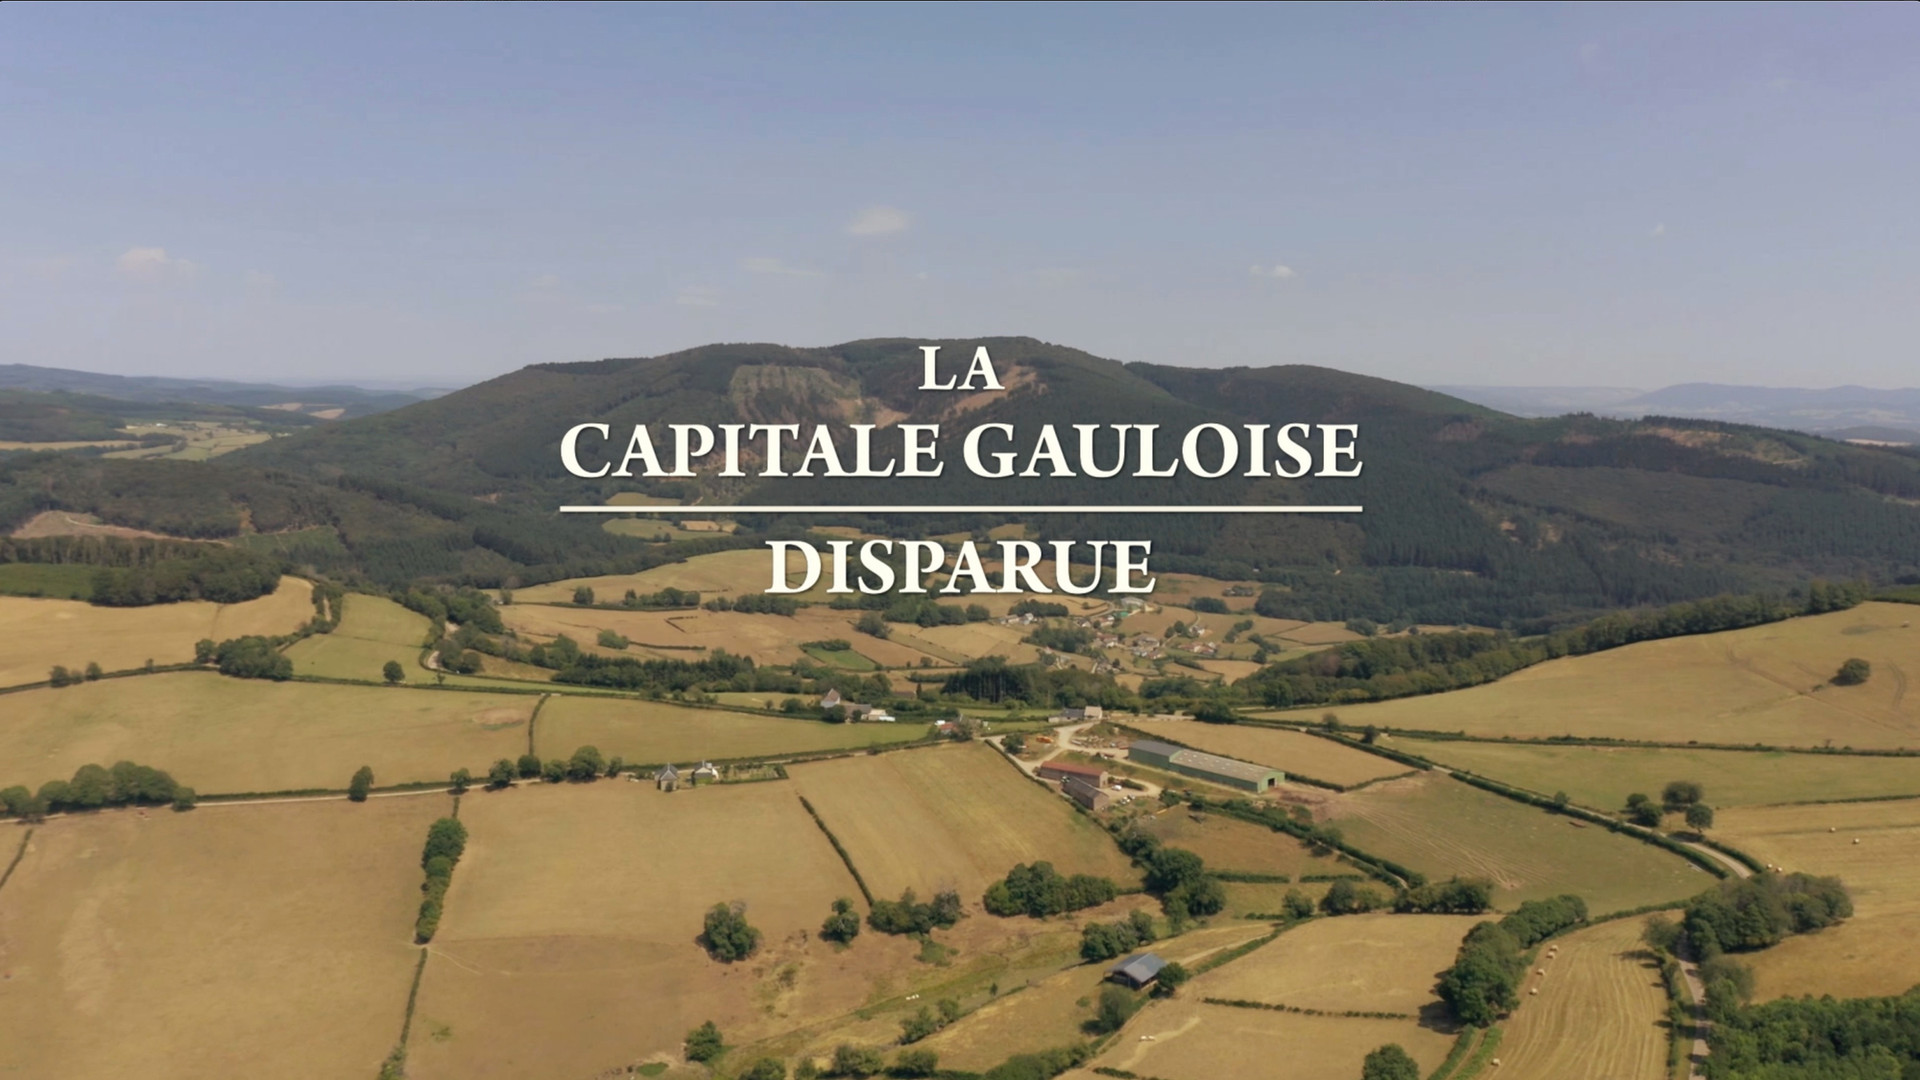 La Capitale Gauloise Disparue • 2020 (52 min)